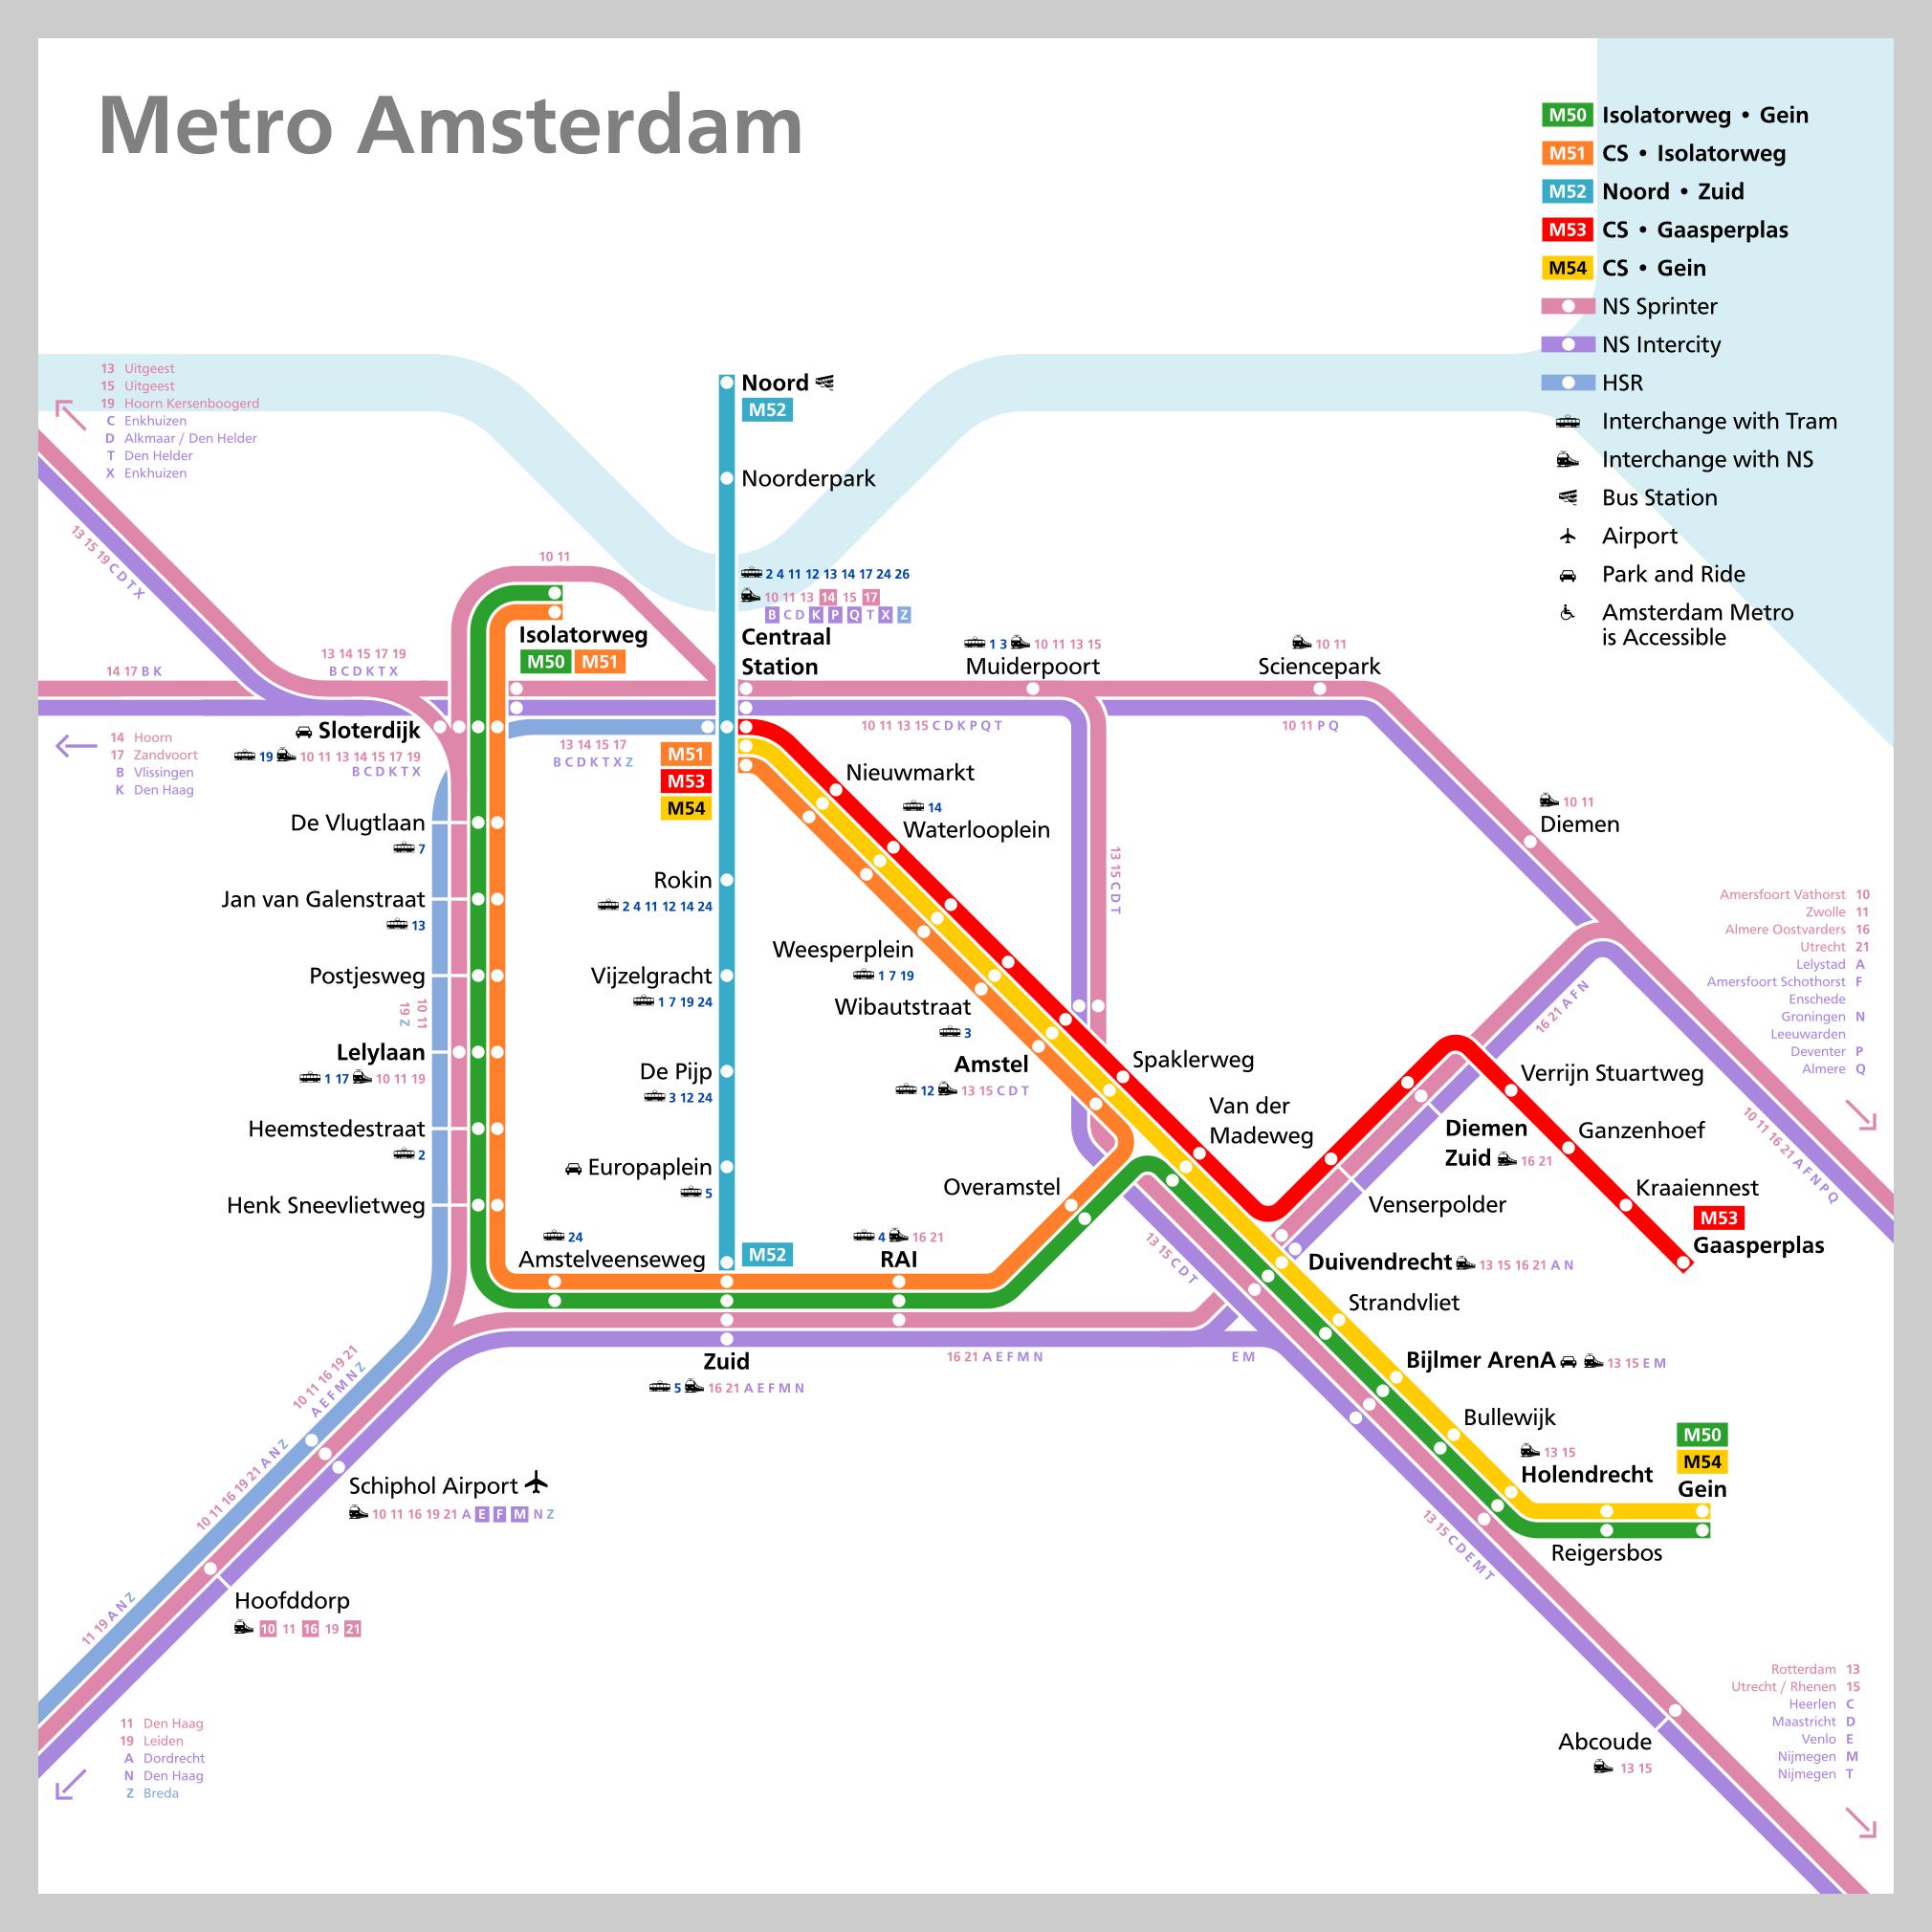 Subway Map Of Amsterdam.Amsterdam Metro Map Theodore Ditsek